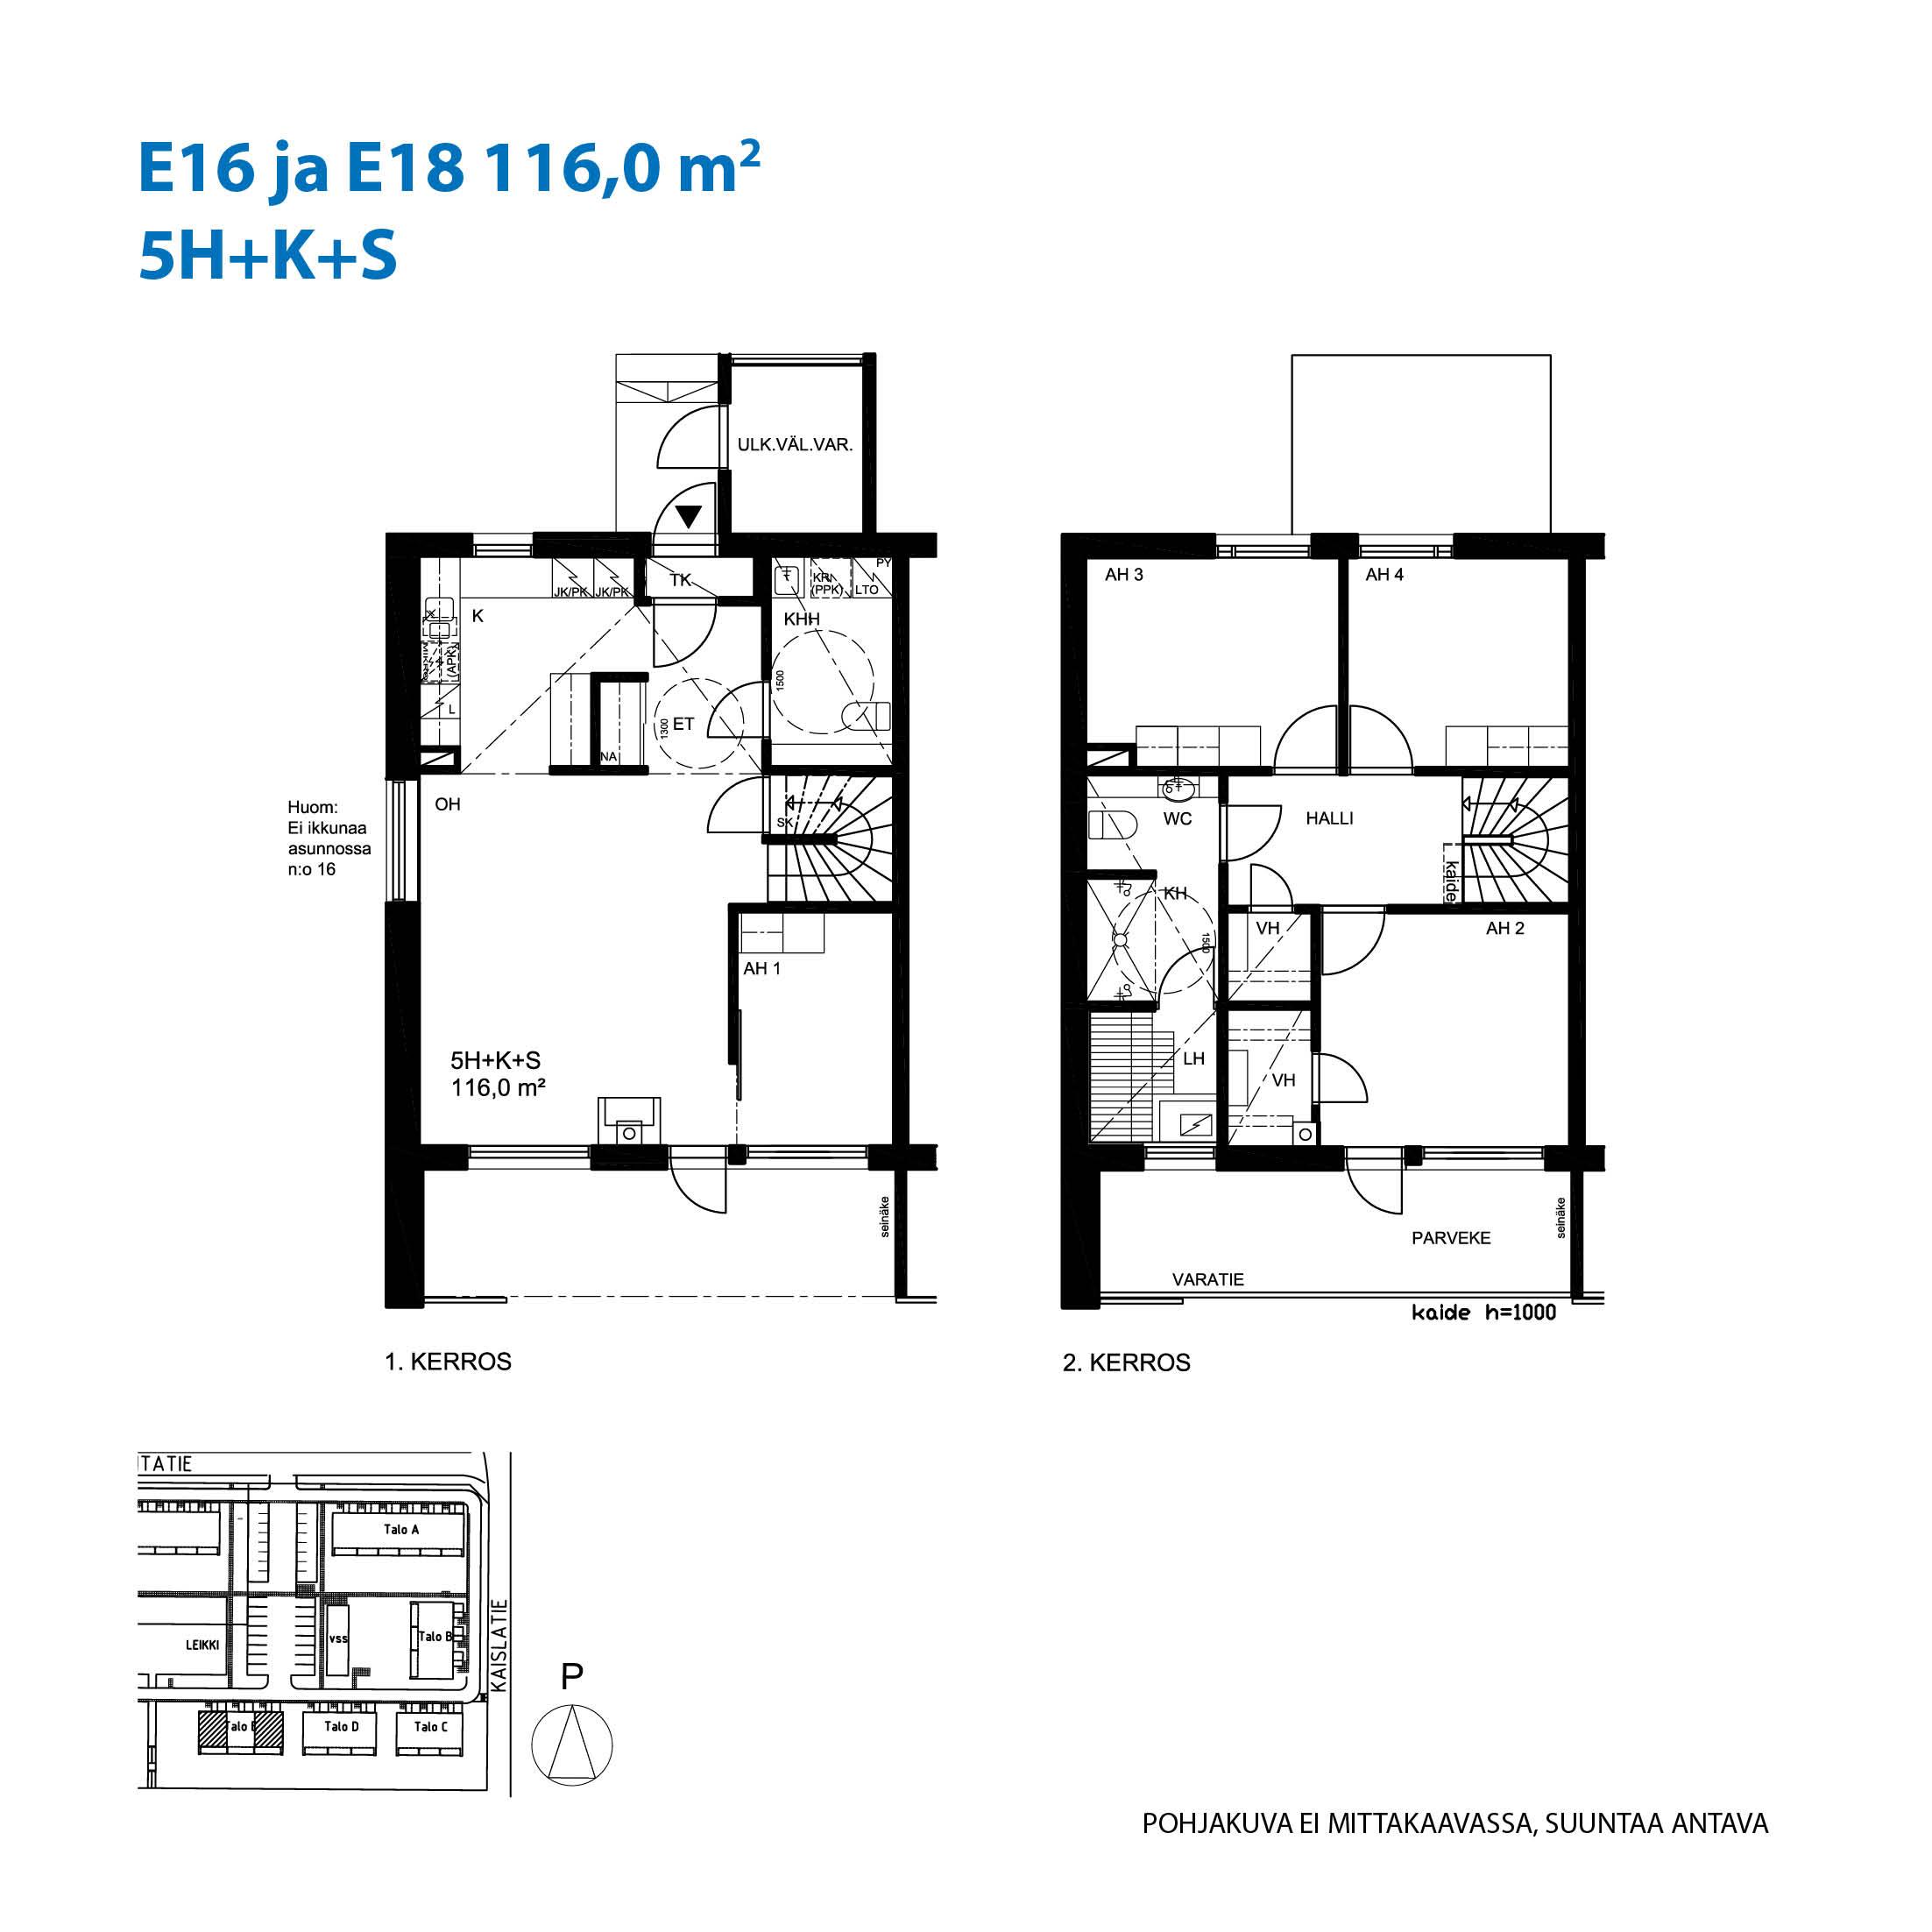 Asunto Oy Raision Rantapuisto - Rantatie 1, 21200, Raisio - 5H+K+S / 116.0m2